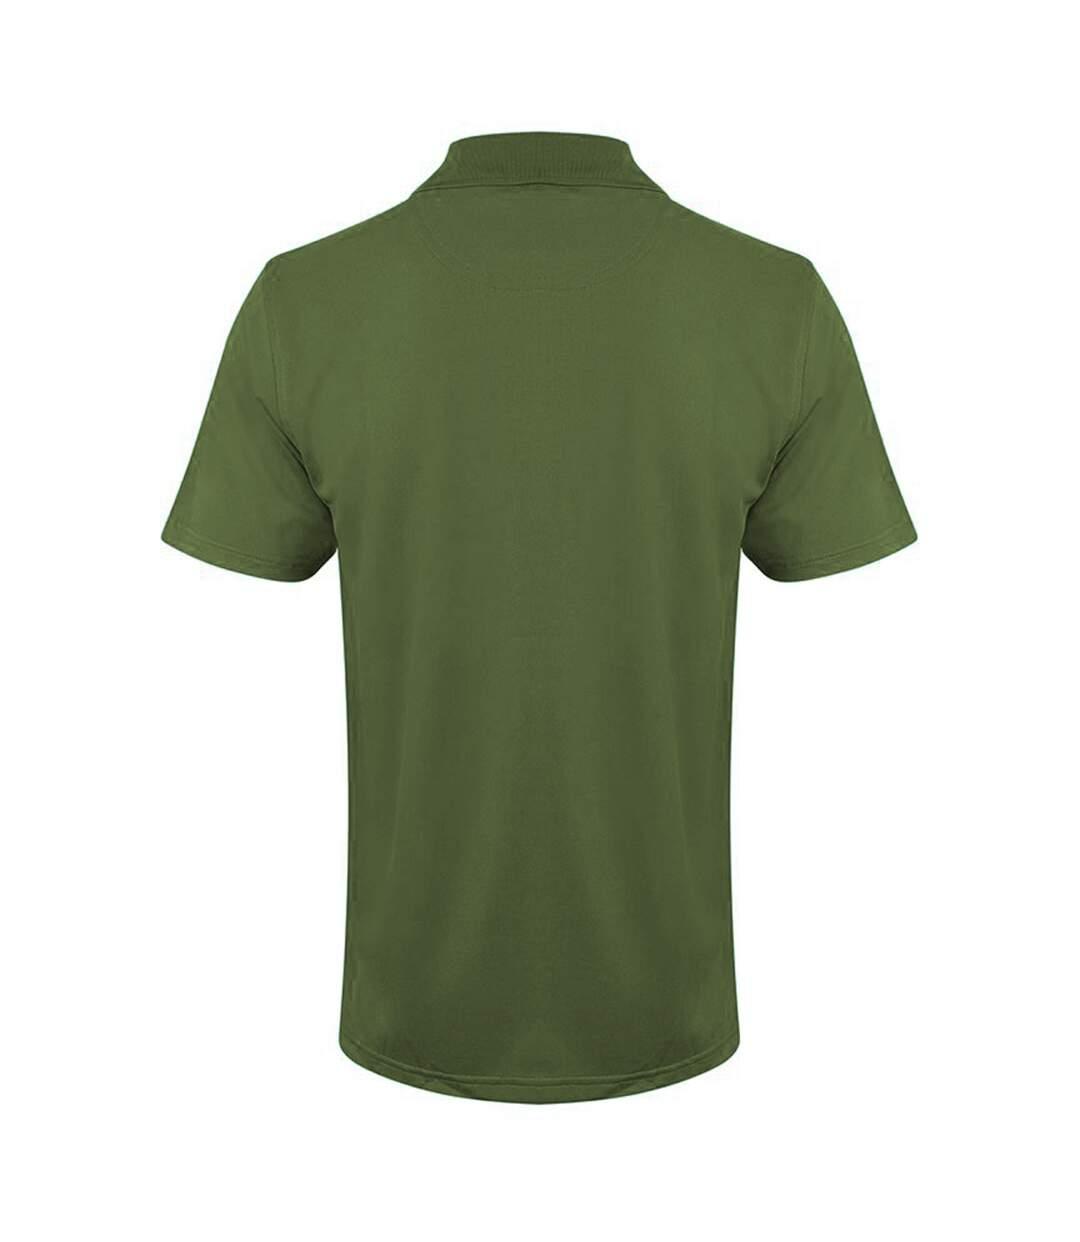 Henbury Mens Coolplus® Pique Polo Shirt (Olive) - UTRW635